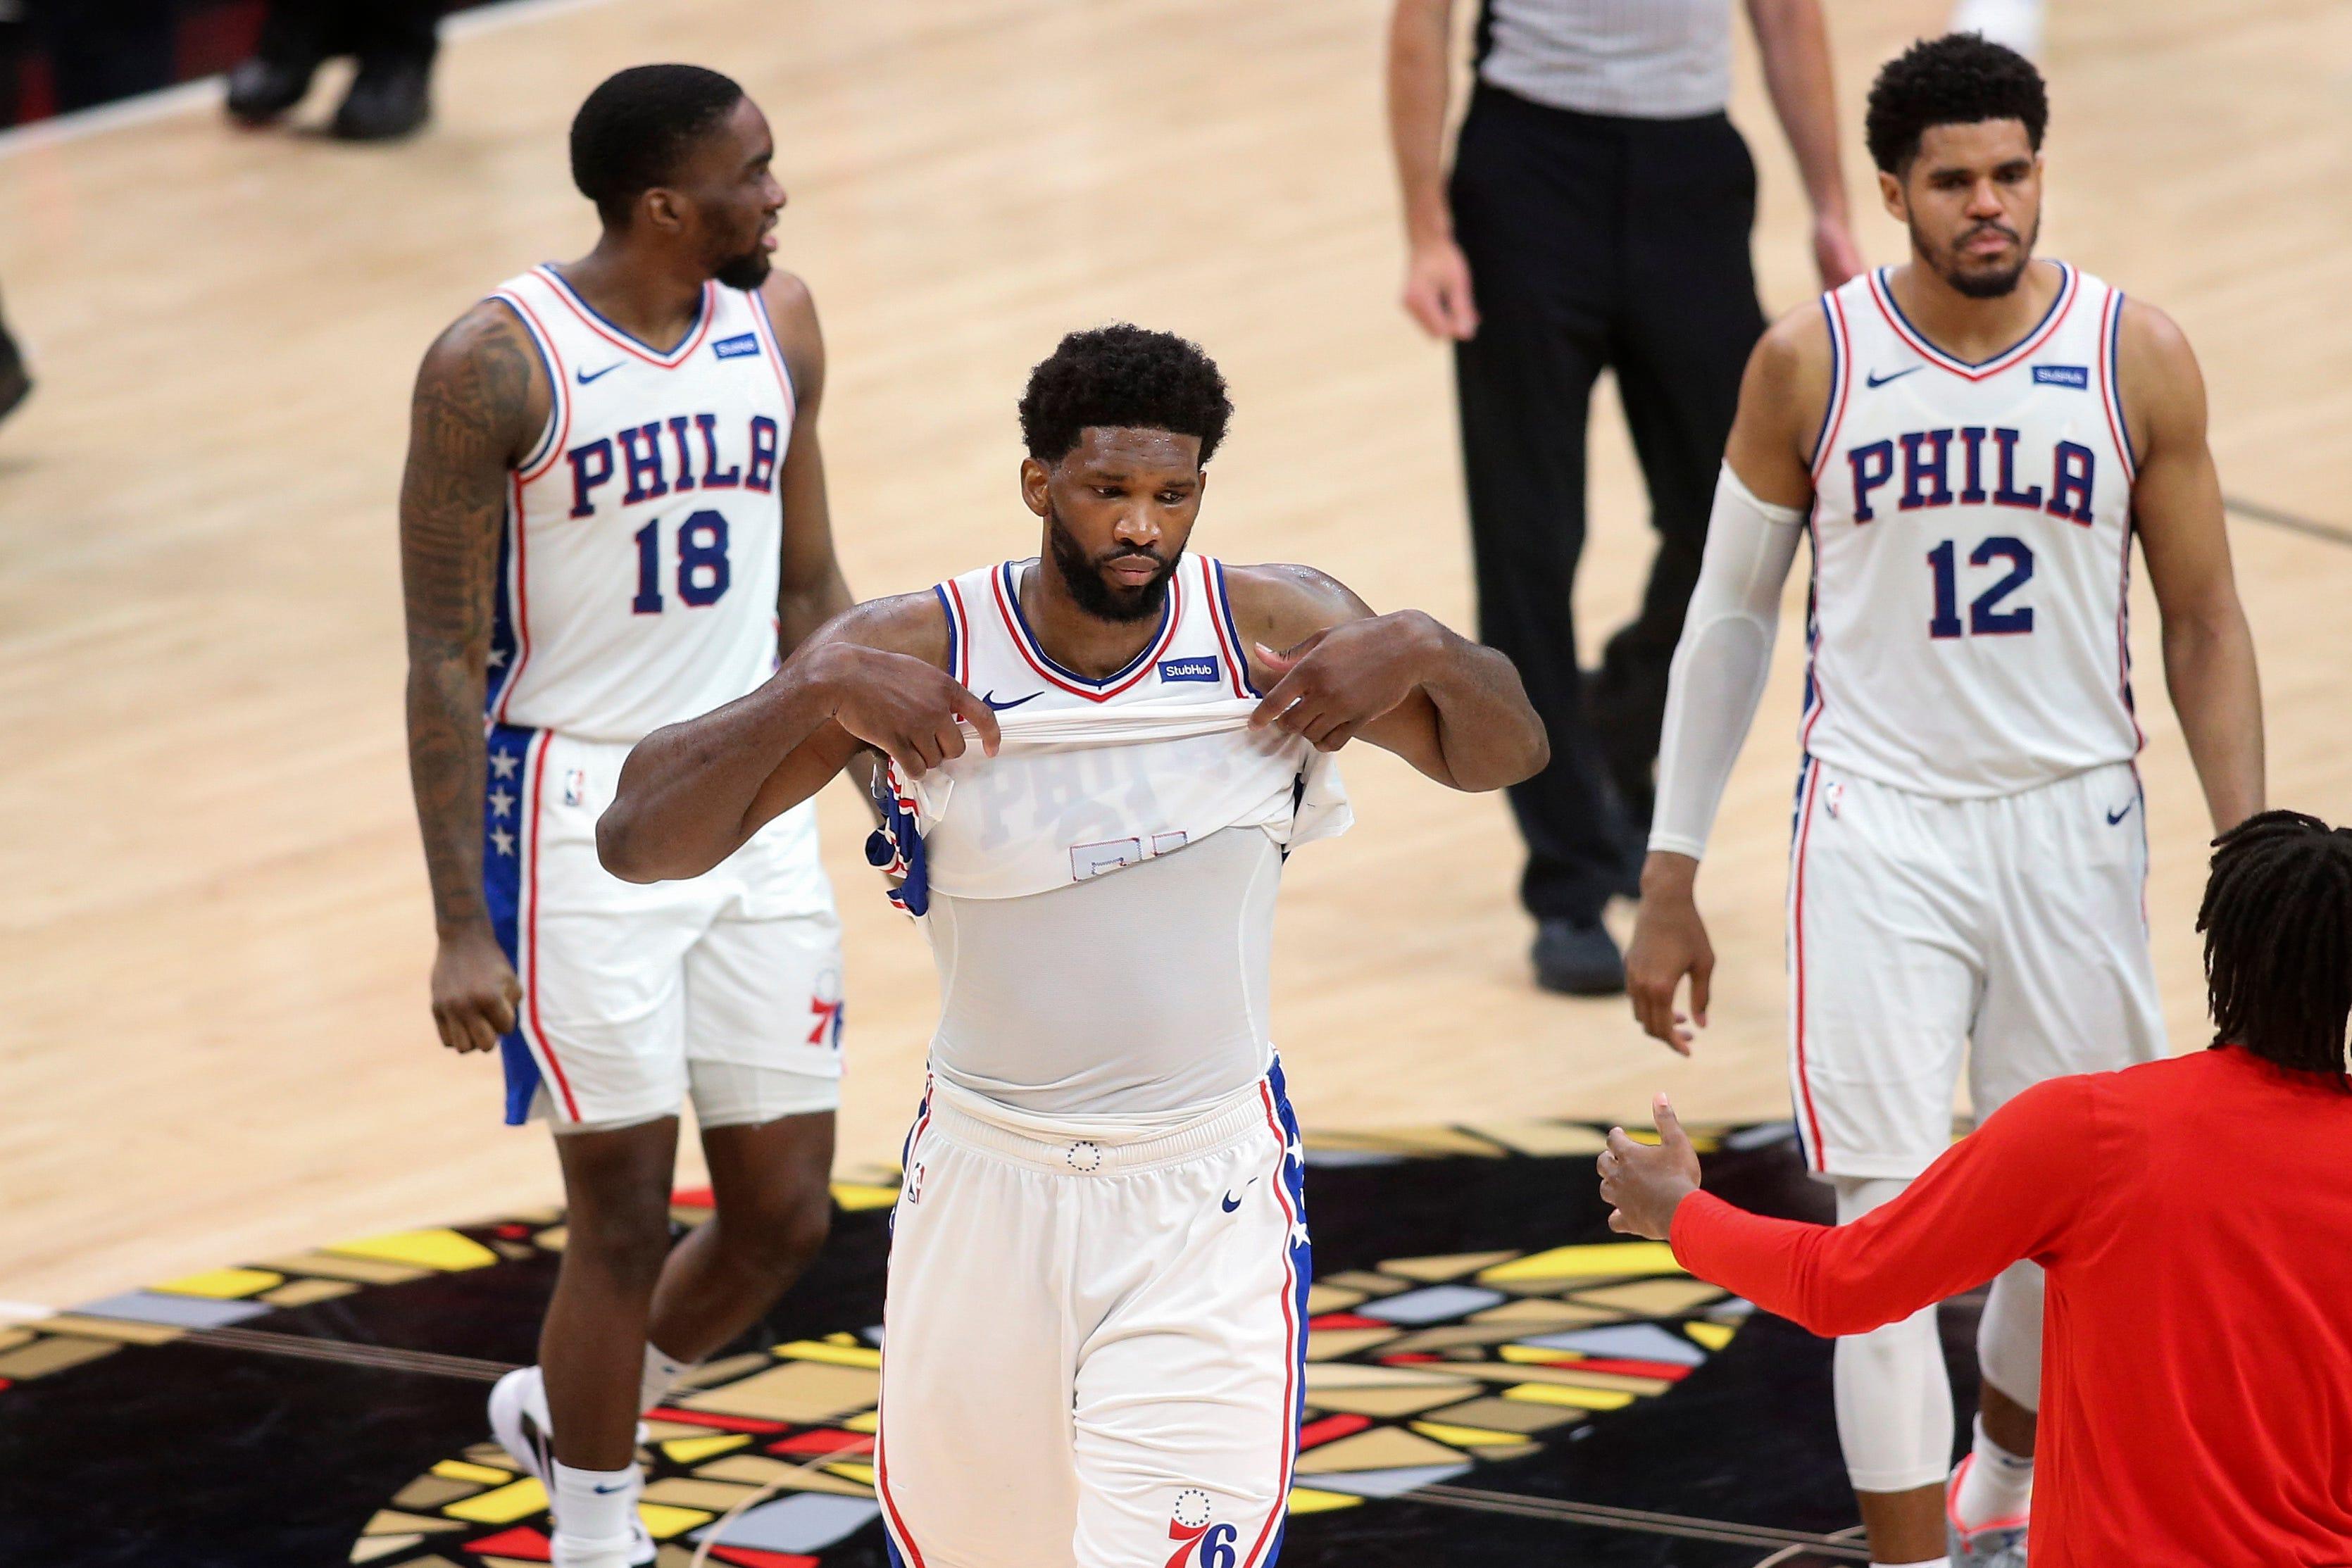 Opinion: Philadelphia 76ers' inability to put away Game 4 breathes life into upstart Atlanta Hawks